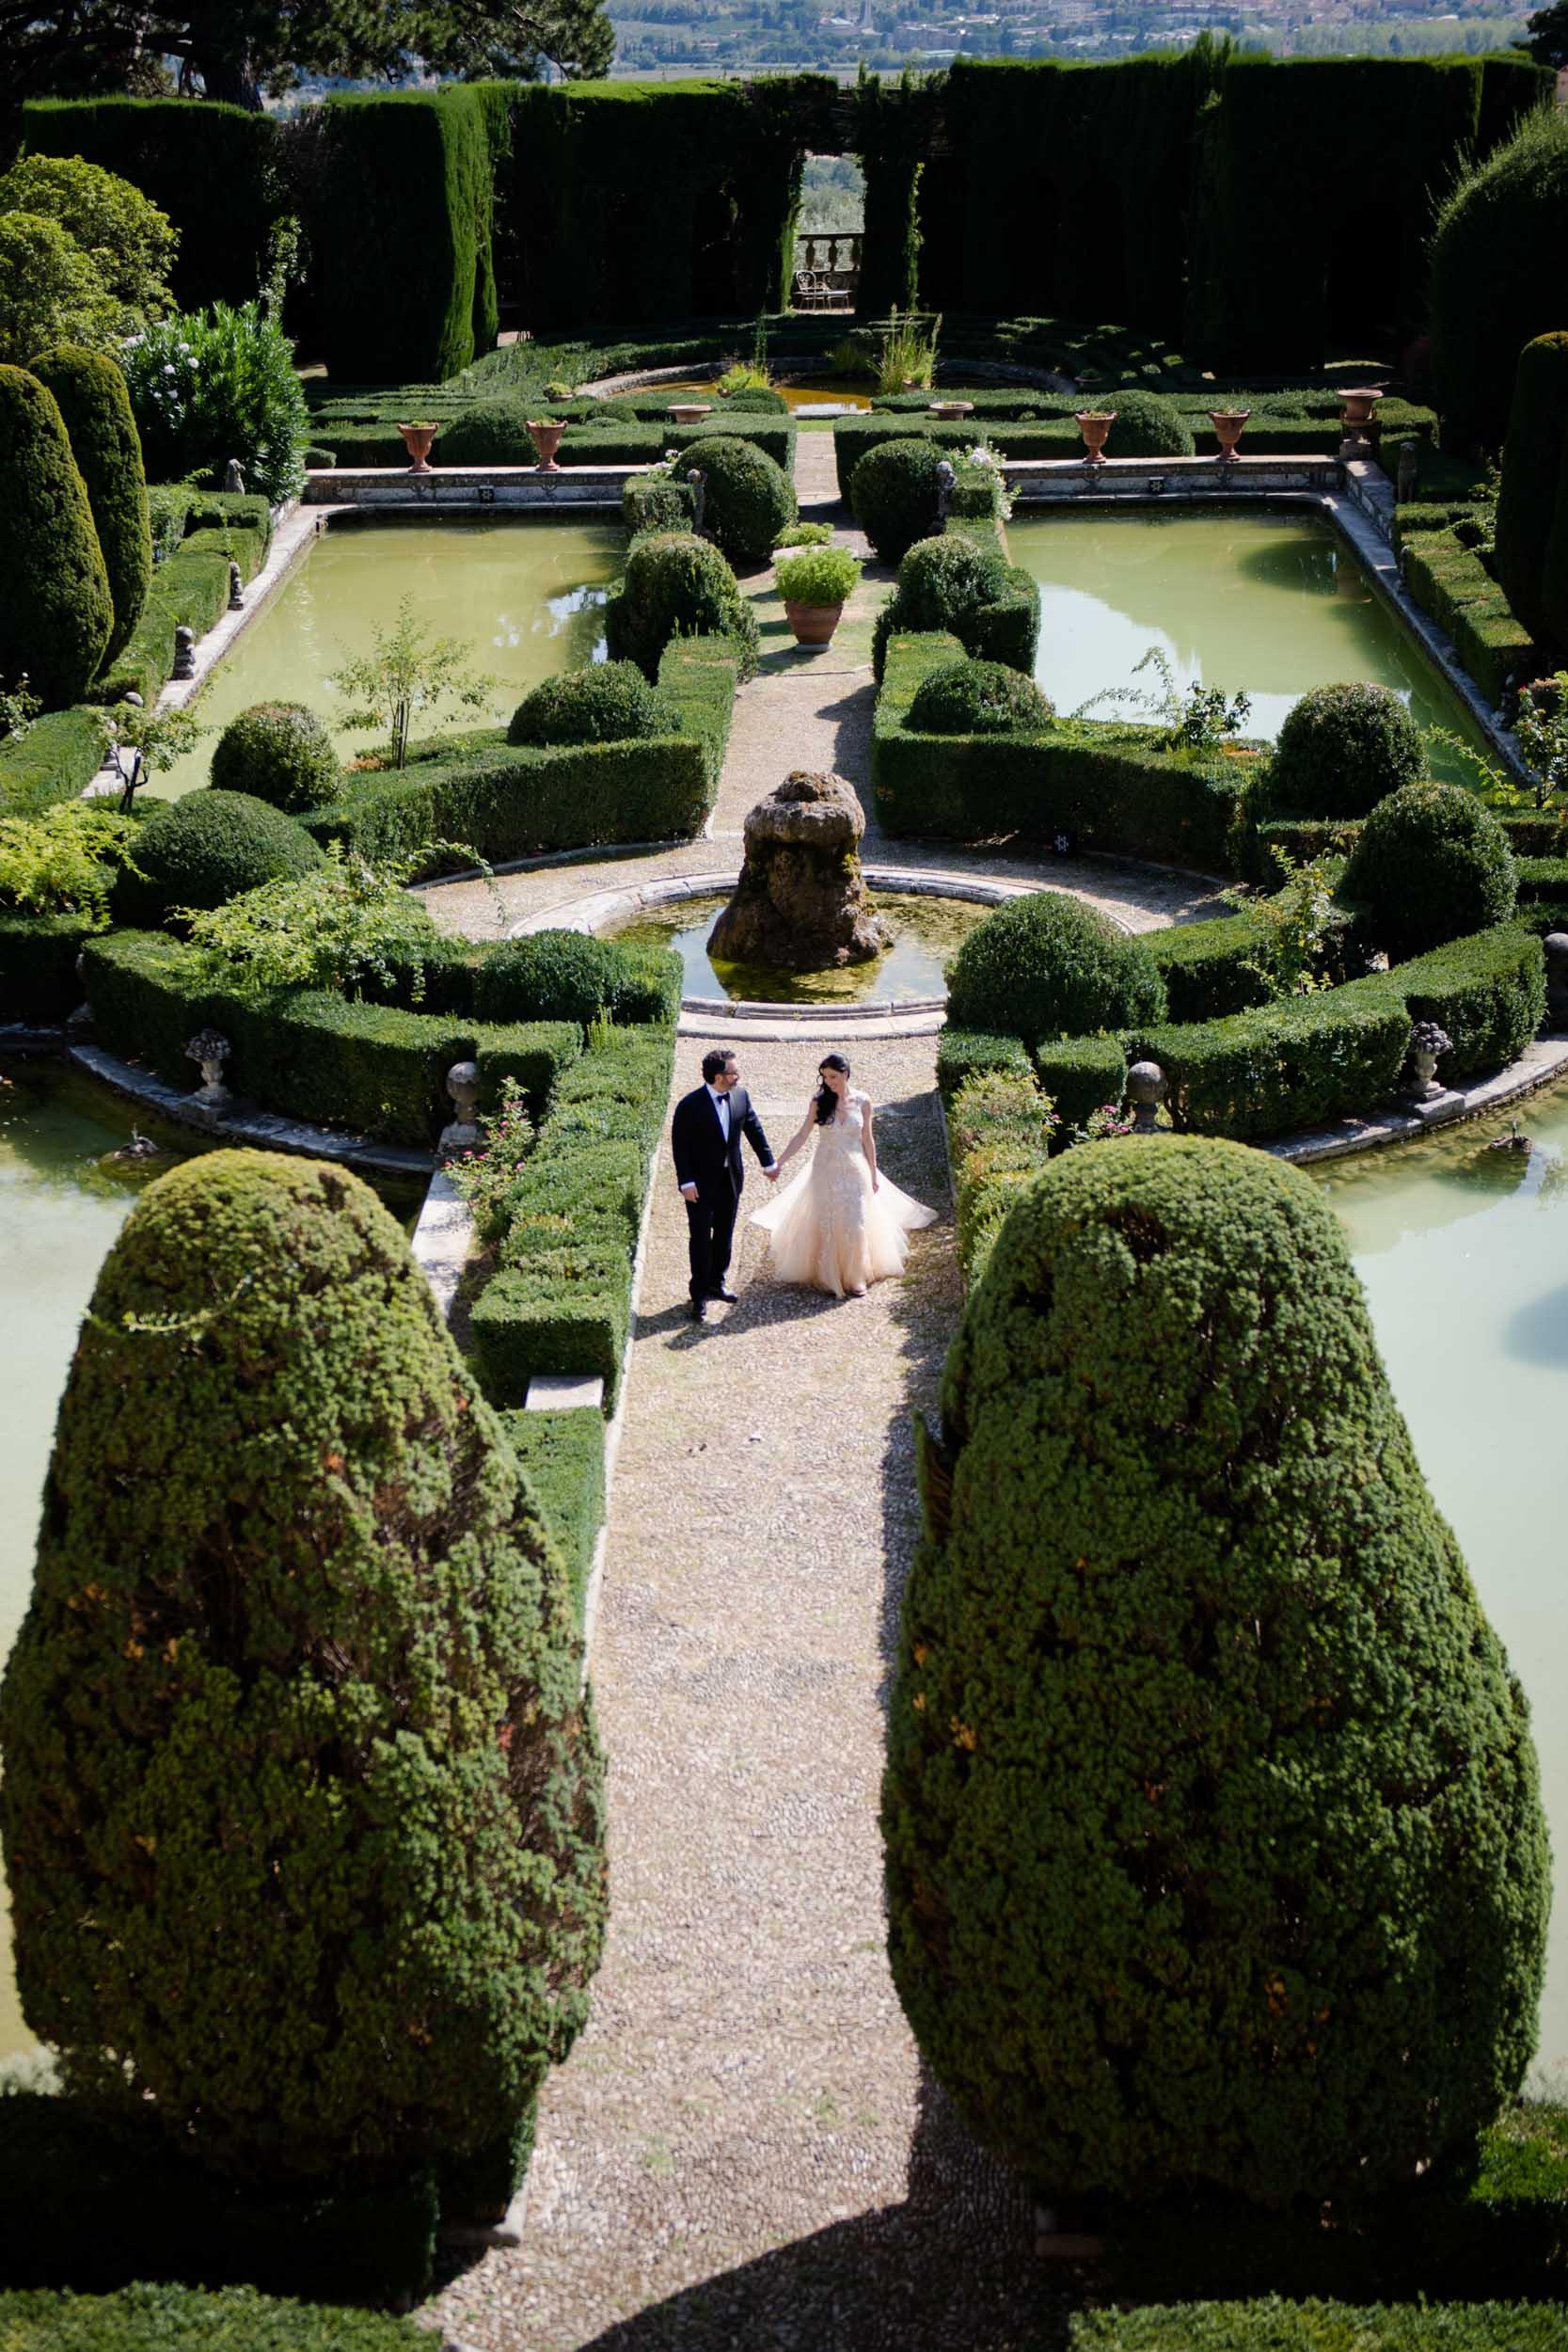 villa-gamberaia-florence-italy-destination-wedding-25.jpg